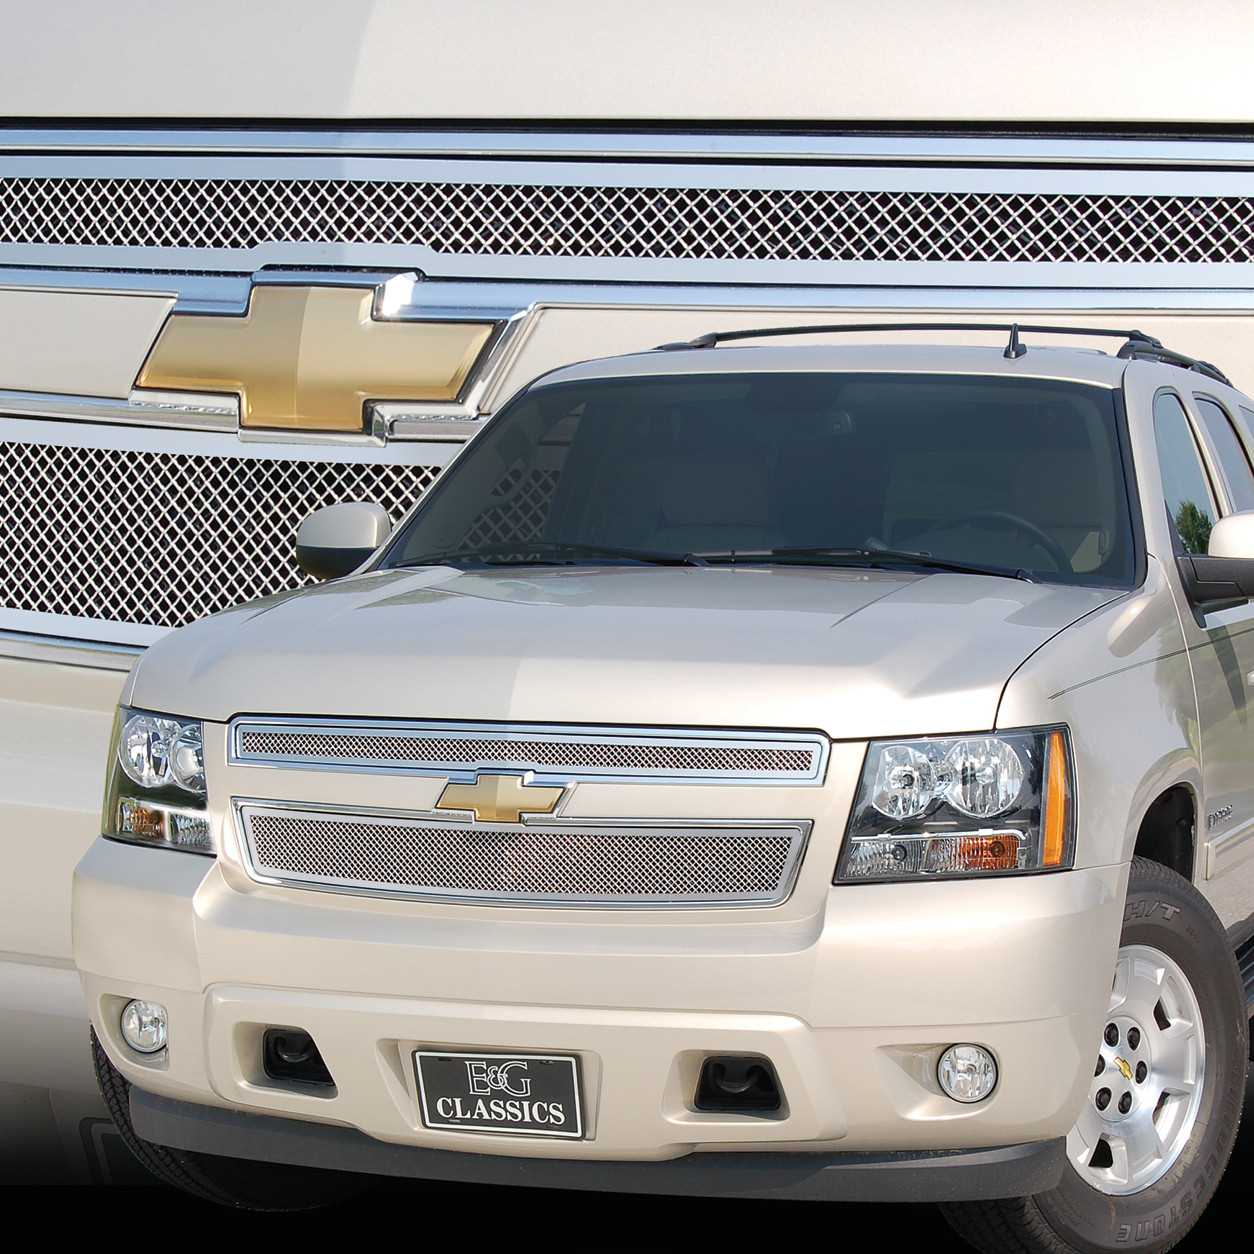 E&G Classics 2007-2014 Chevrolet Tahoe Grille Fine Mesh